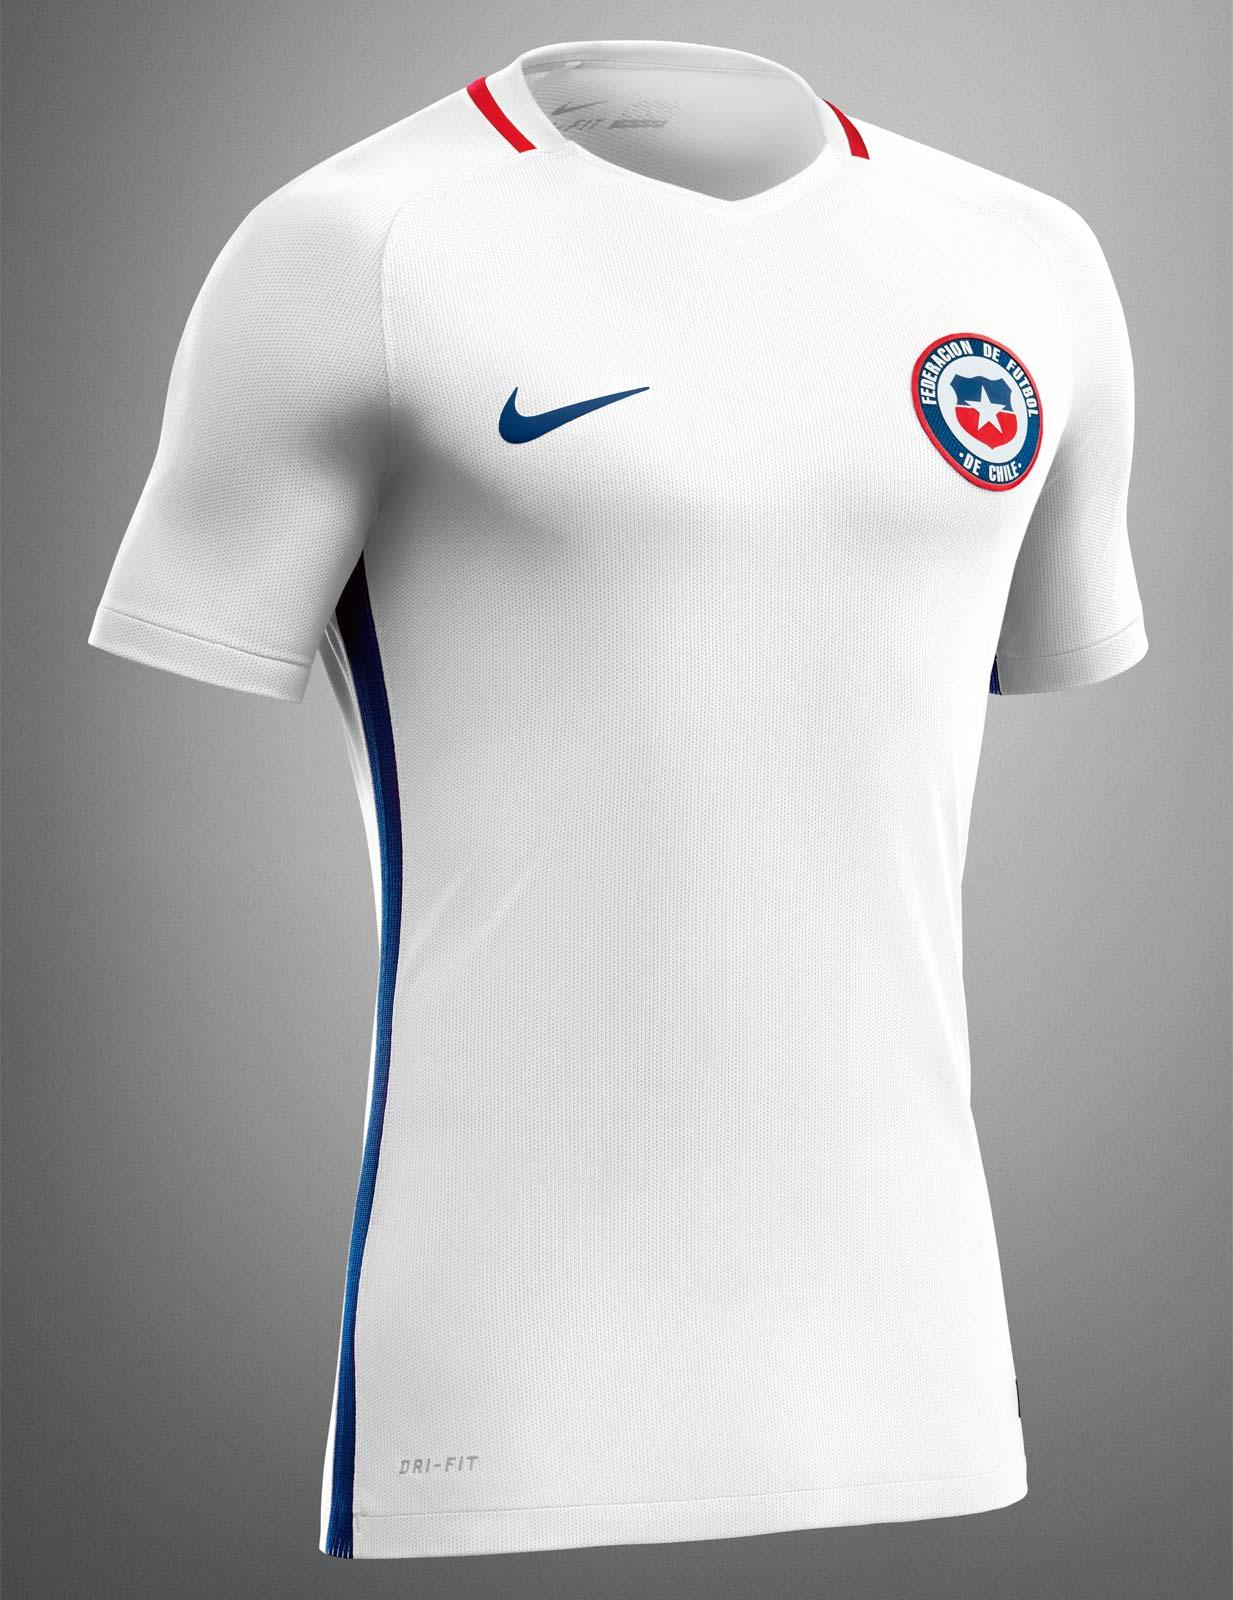 9c324986d Copa America Centenario kits